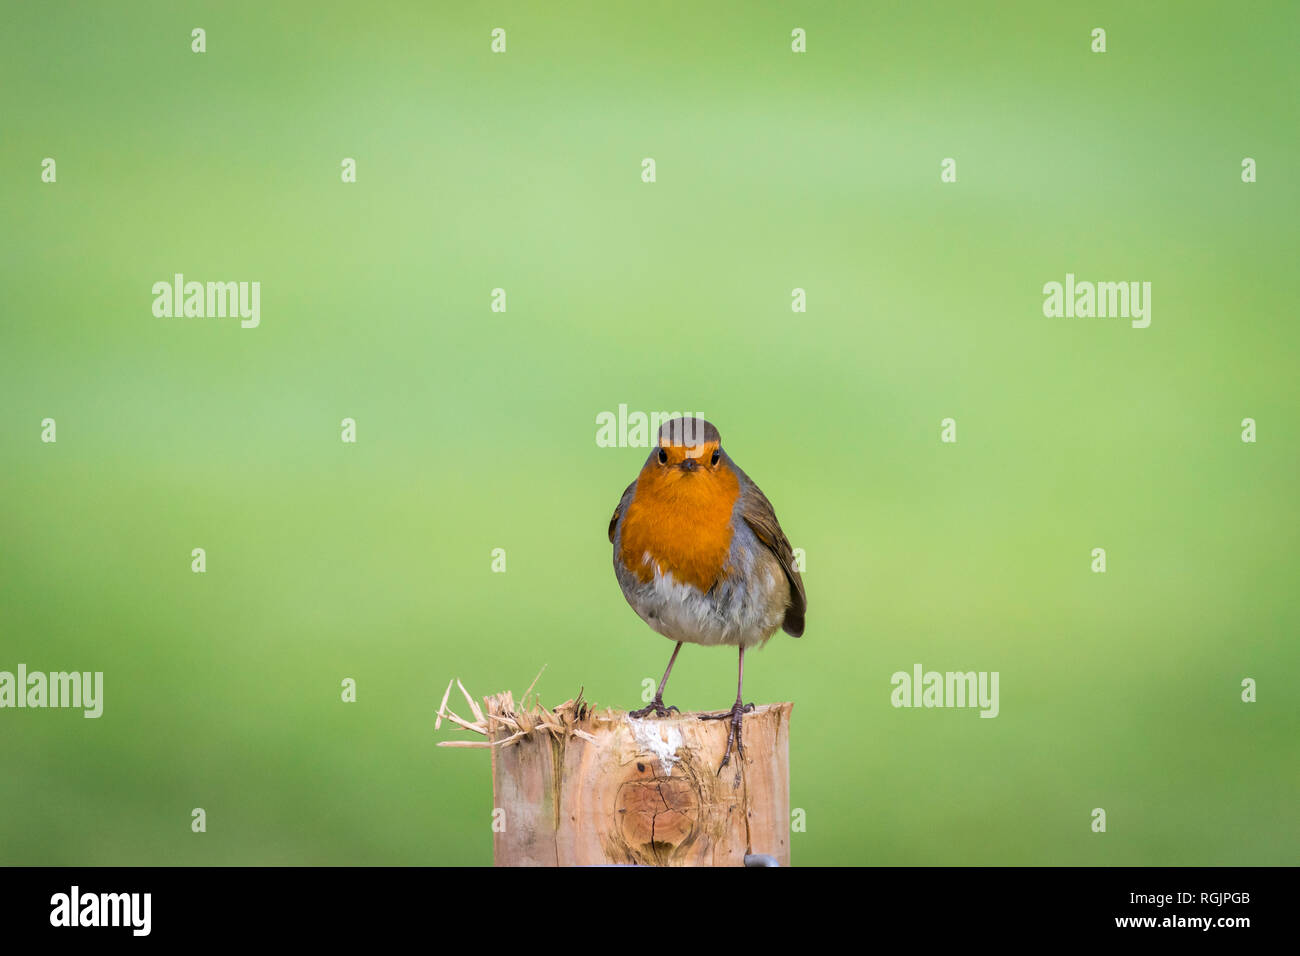 UK, Scotland, Caerlaverock, European Robin (Erithacus rubecula) - Stock Image